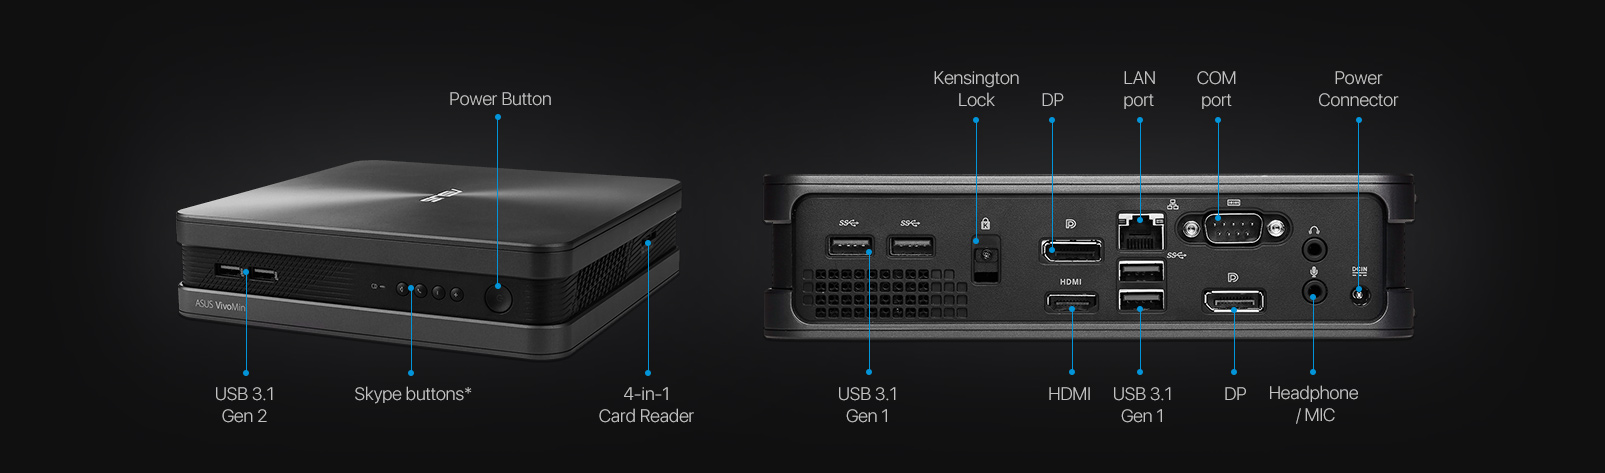 VivoMini VC68V-Mini PC- HDMI-4K- optimaler Mini-PC für TV